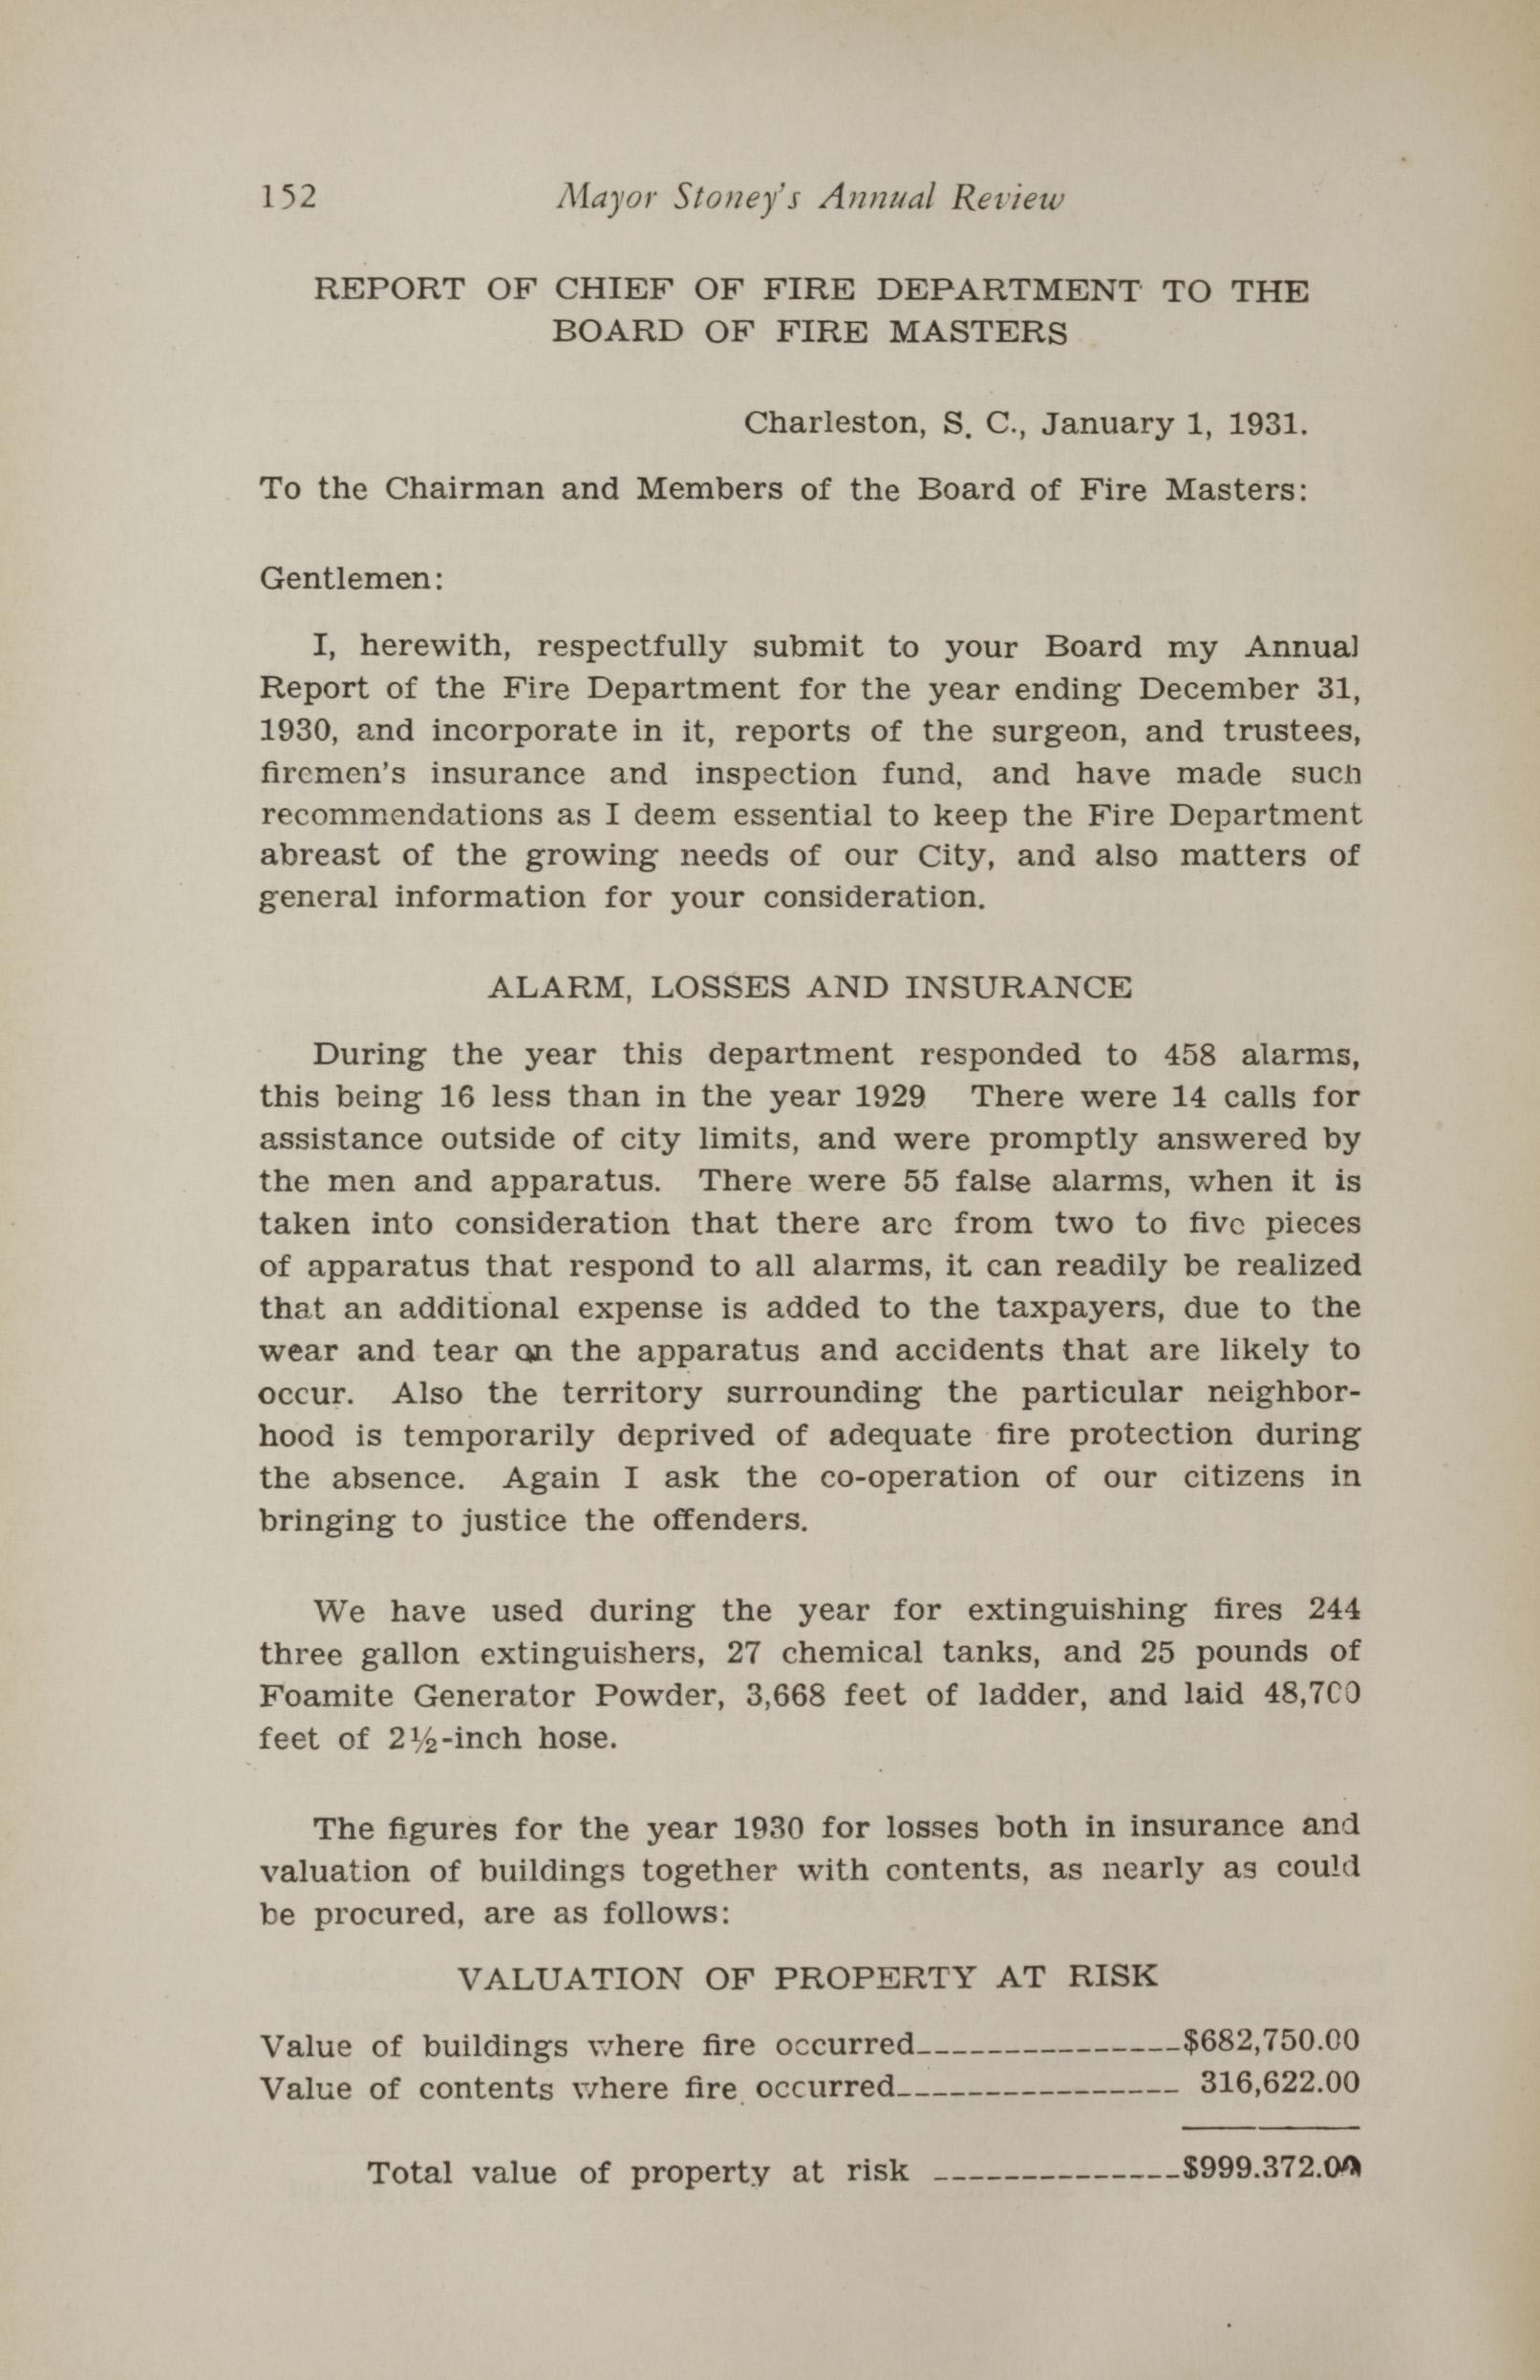 Charleston Yearbook, 1930, page 152